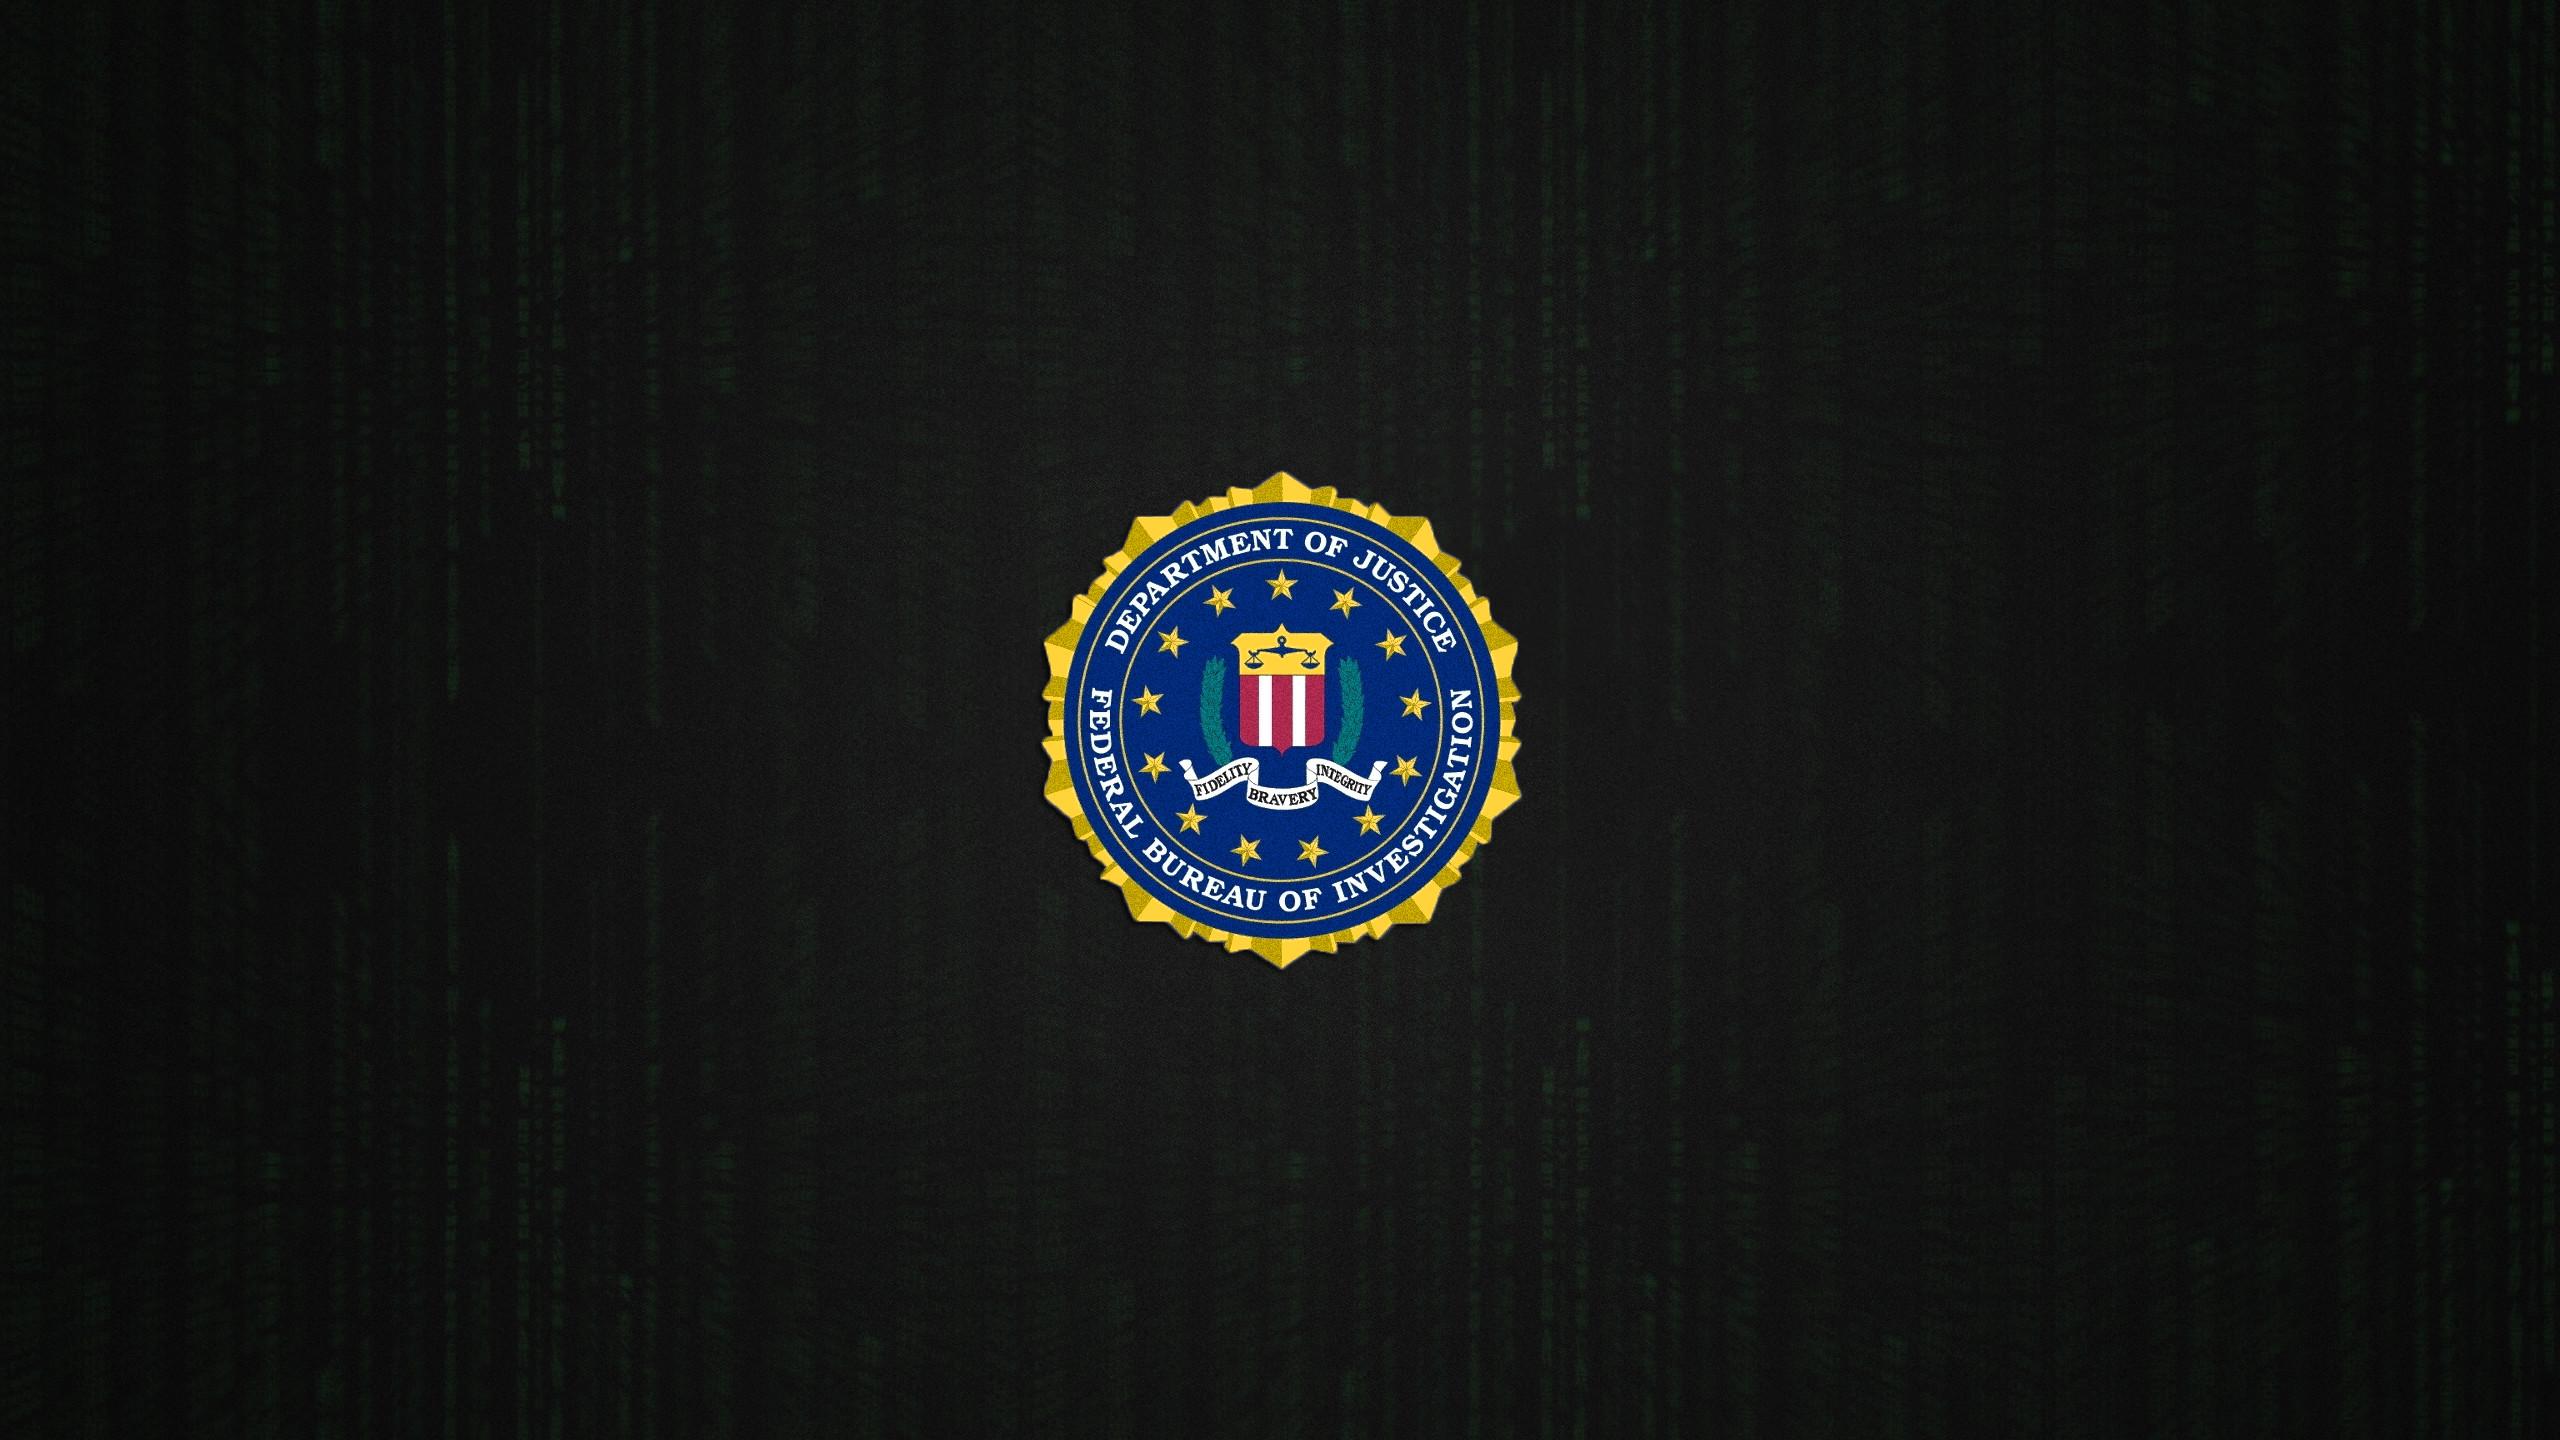 HD Wallpaper   Background ID:562371